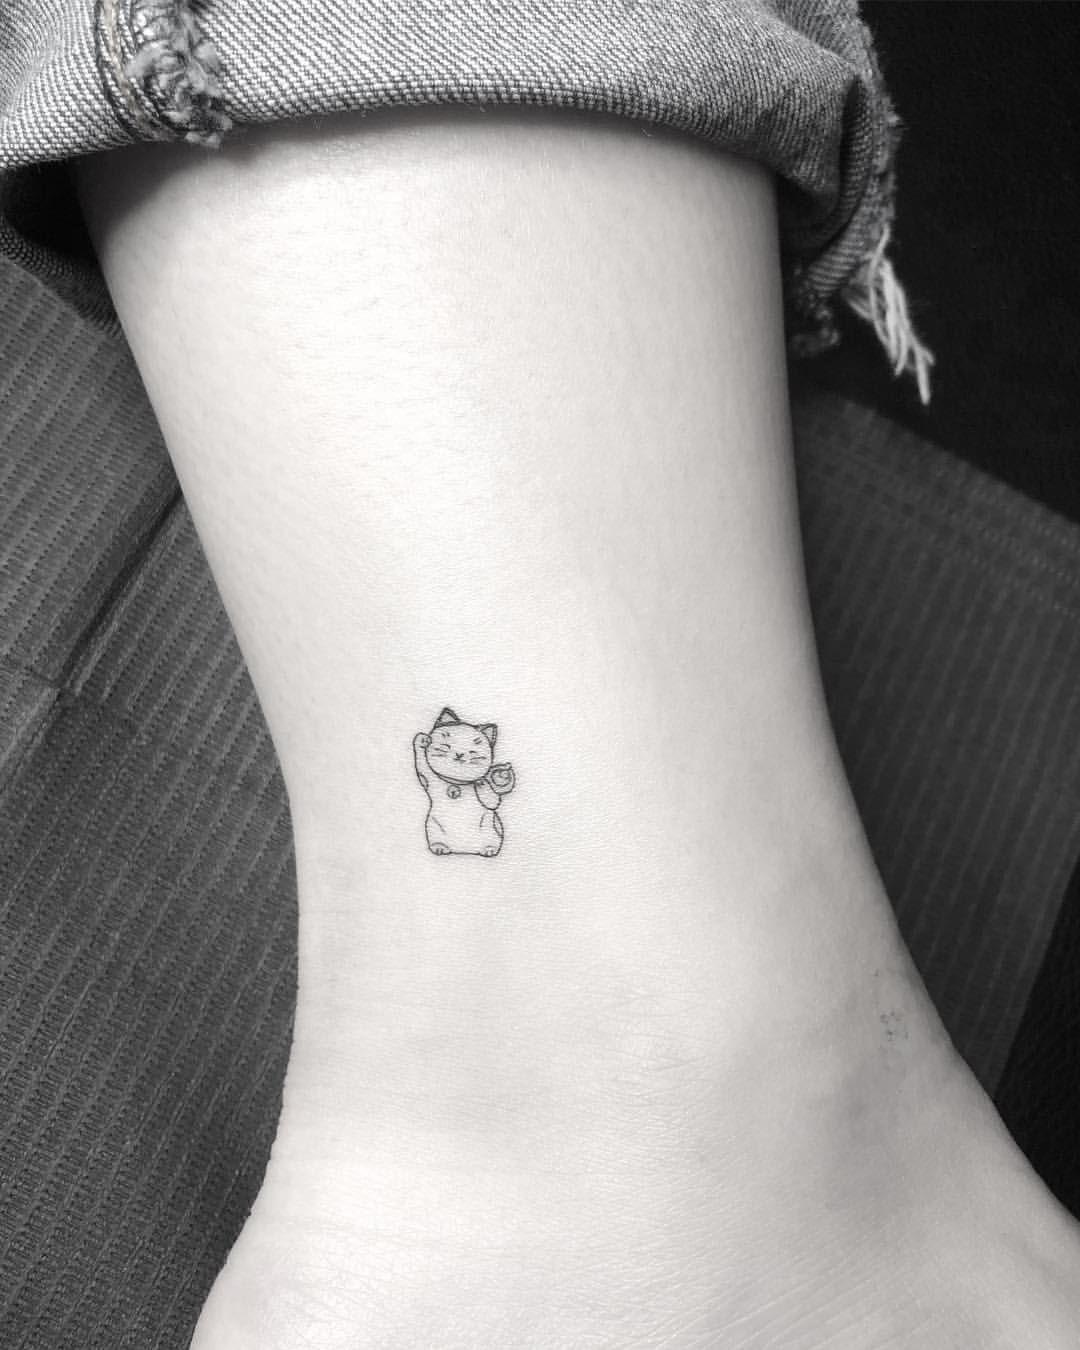 Lucky Cat Outline Tattoo 3 4 Inch Maneki Neko Evantattoo Evantattooinnyc Tattootrip Minimalist Tattoo Lucky Cat Tattoo Tiny Tattoos For Girls